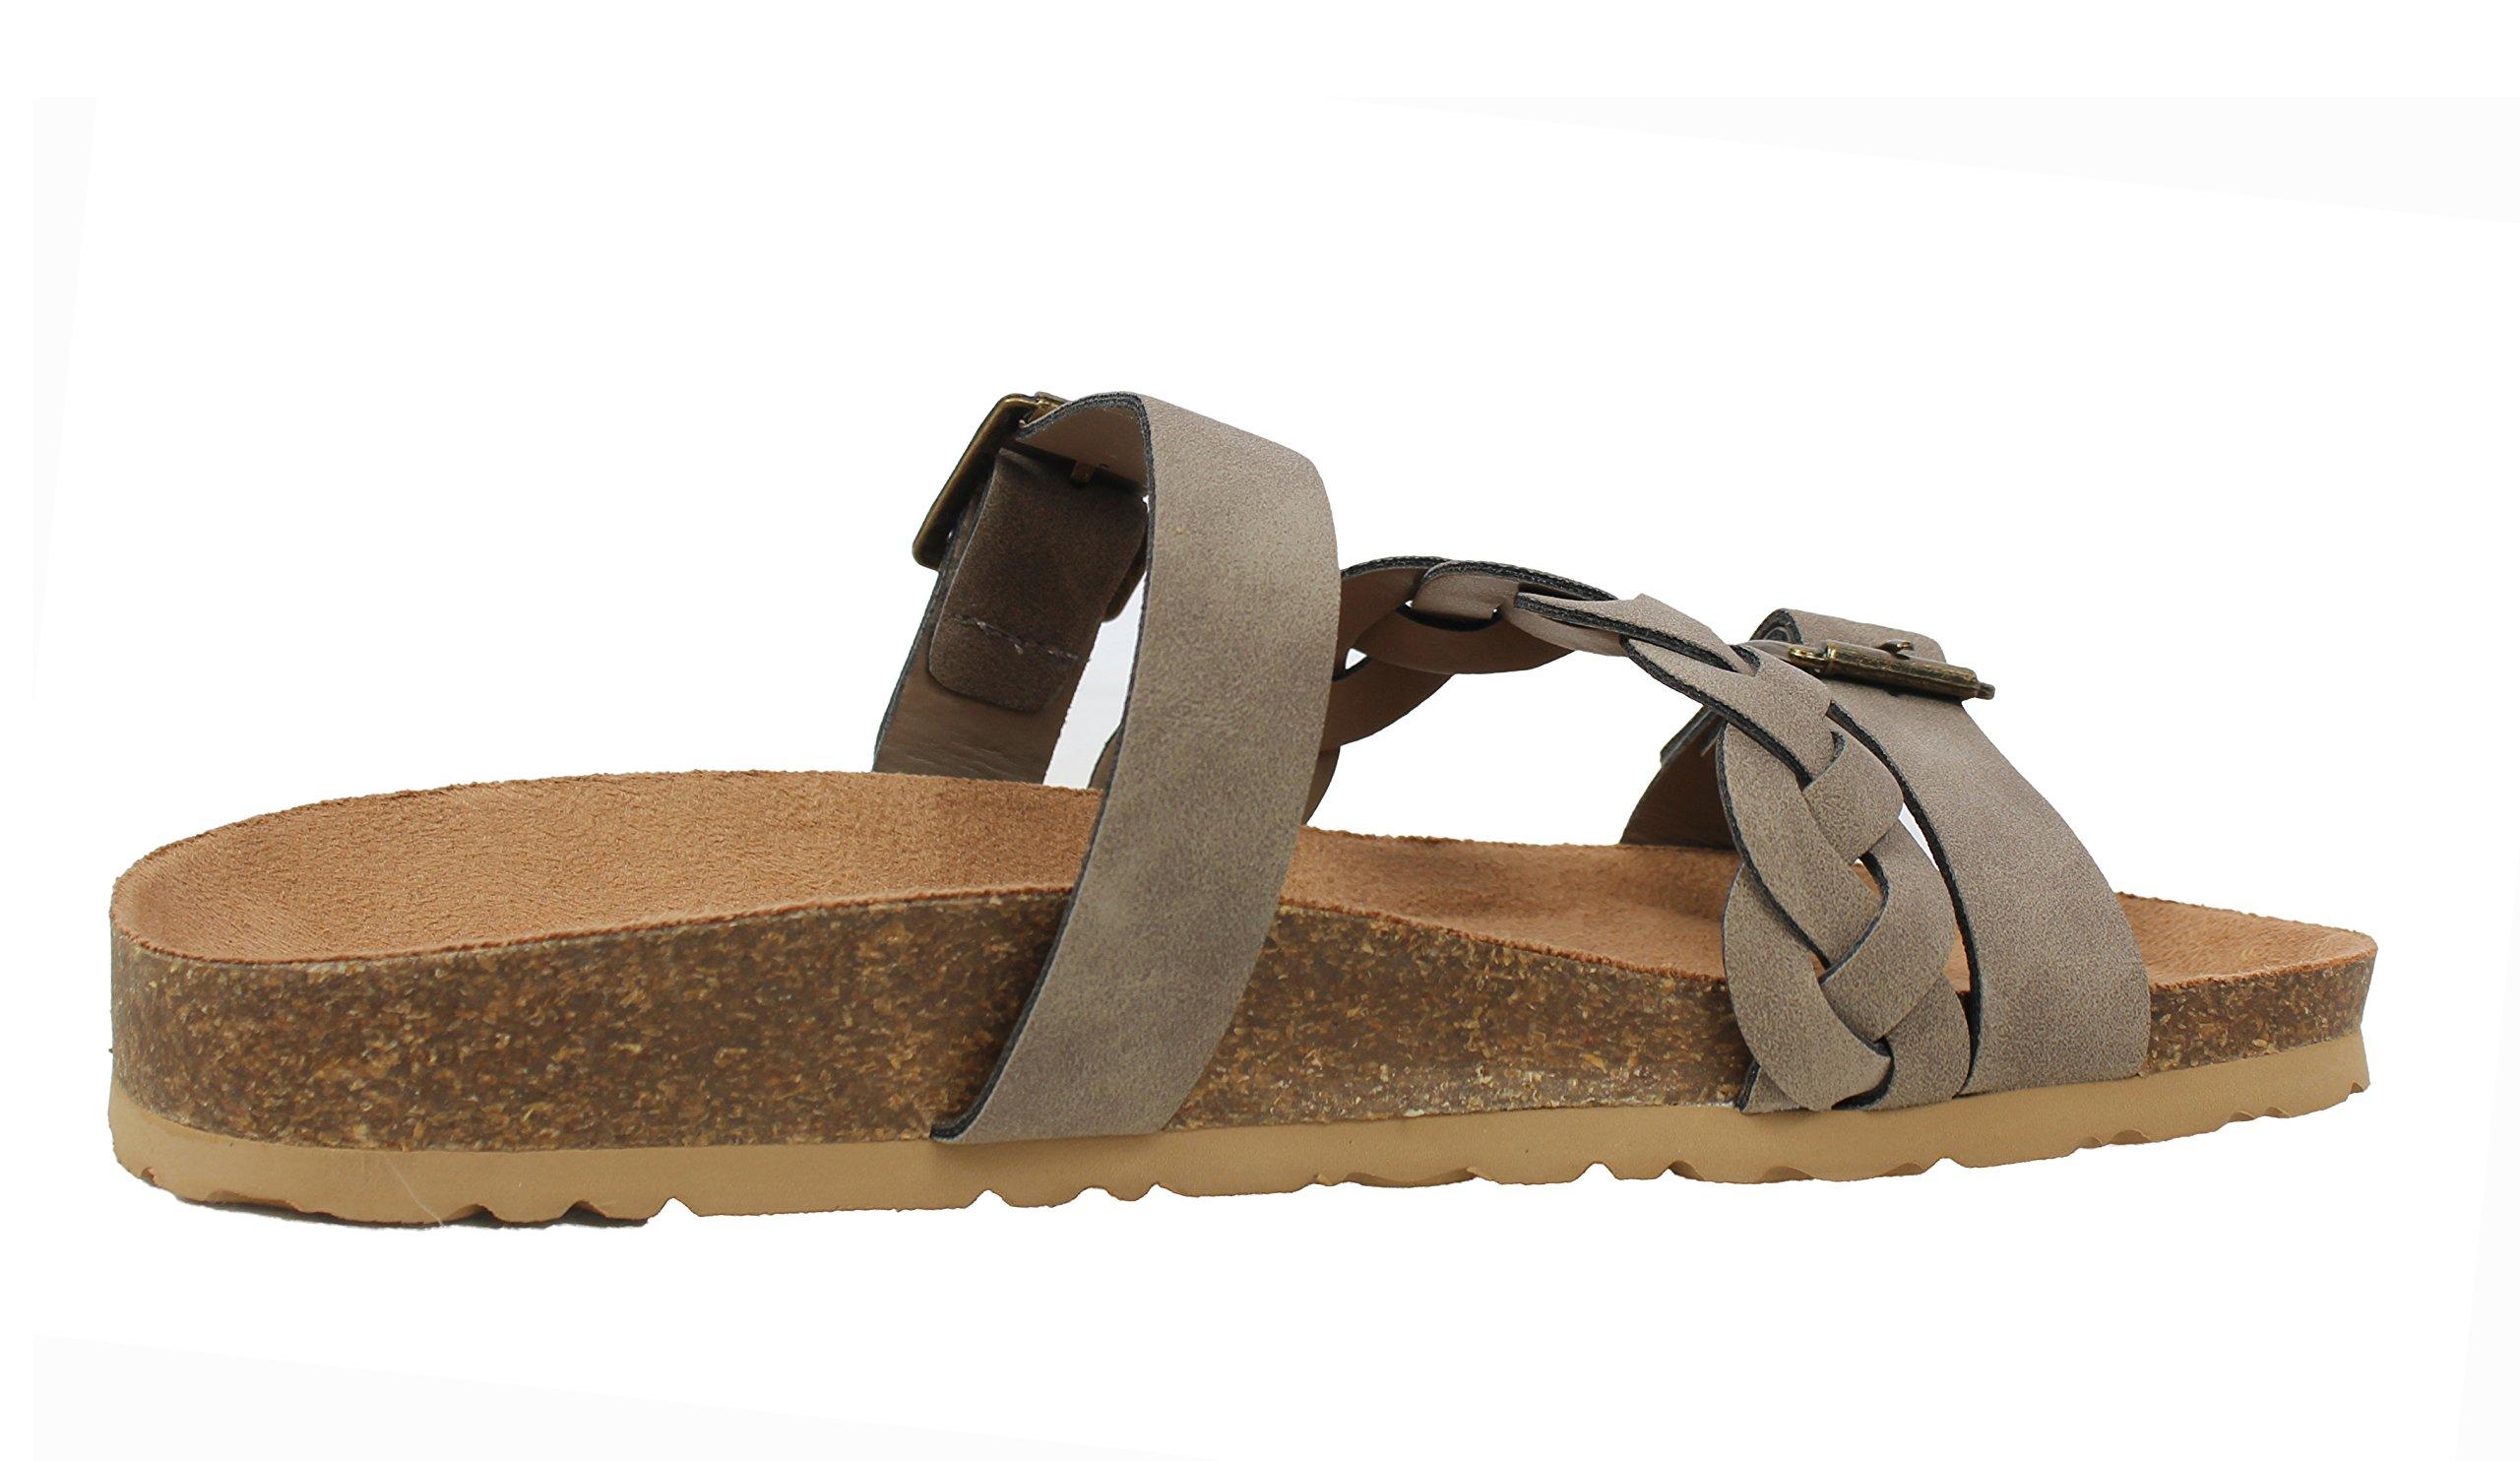 Soda Women's Buckle Strap Braided Cork Platform Slip On Sandal, Taupe, 85 M US by Soda (Image #4)